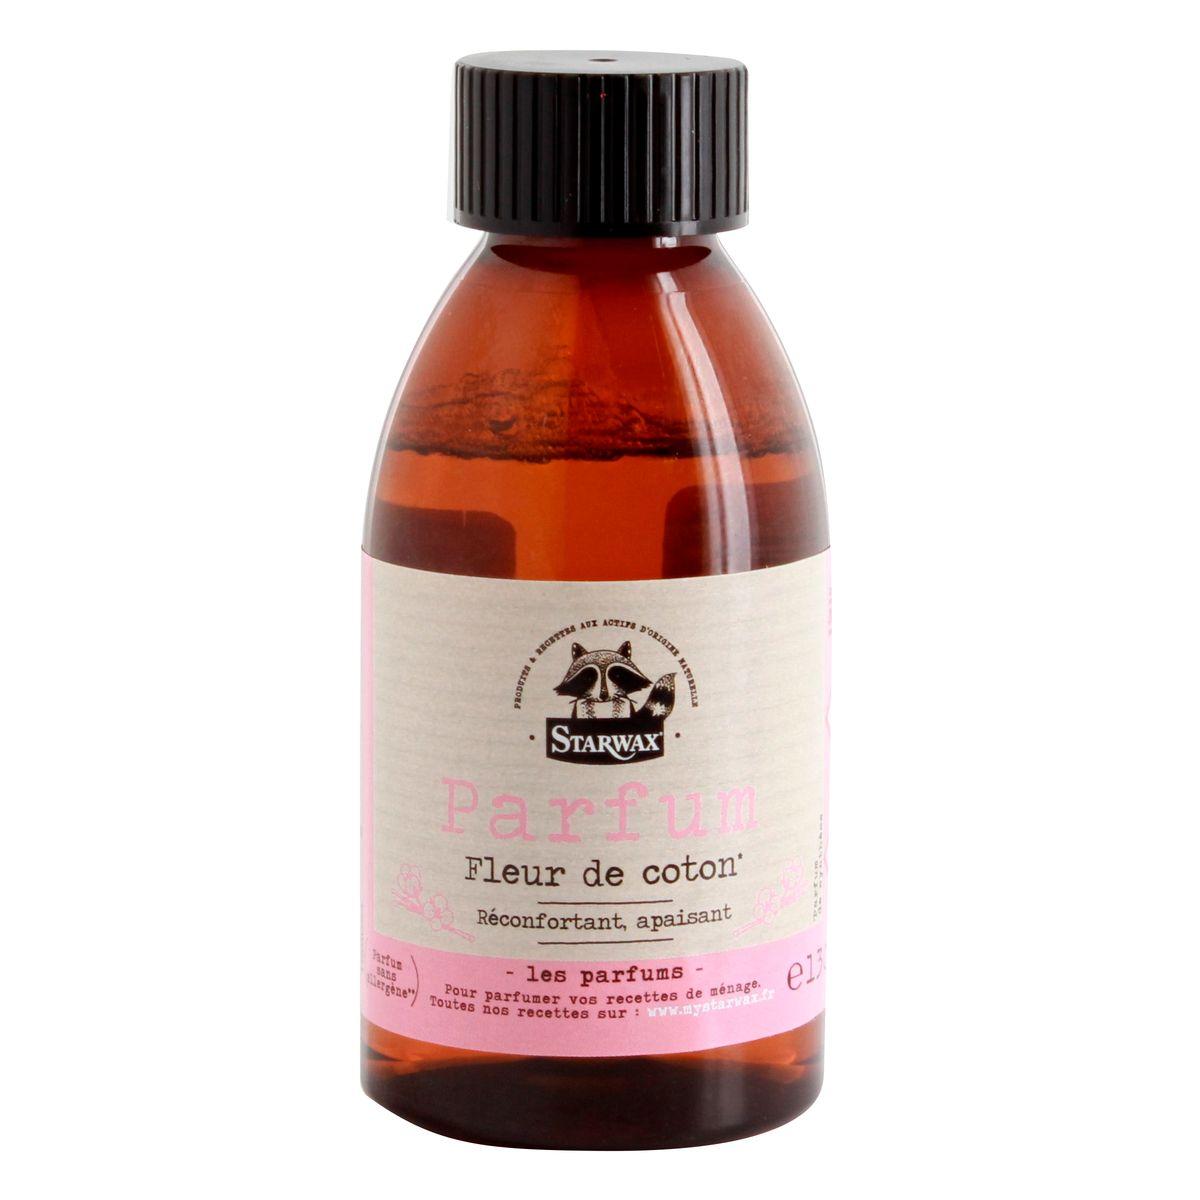 Parfum fleur de coton 130ml - My Starwax